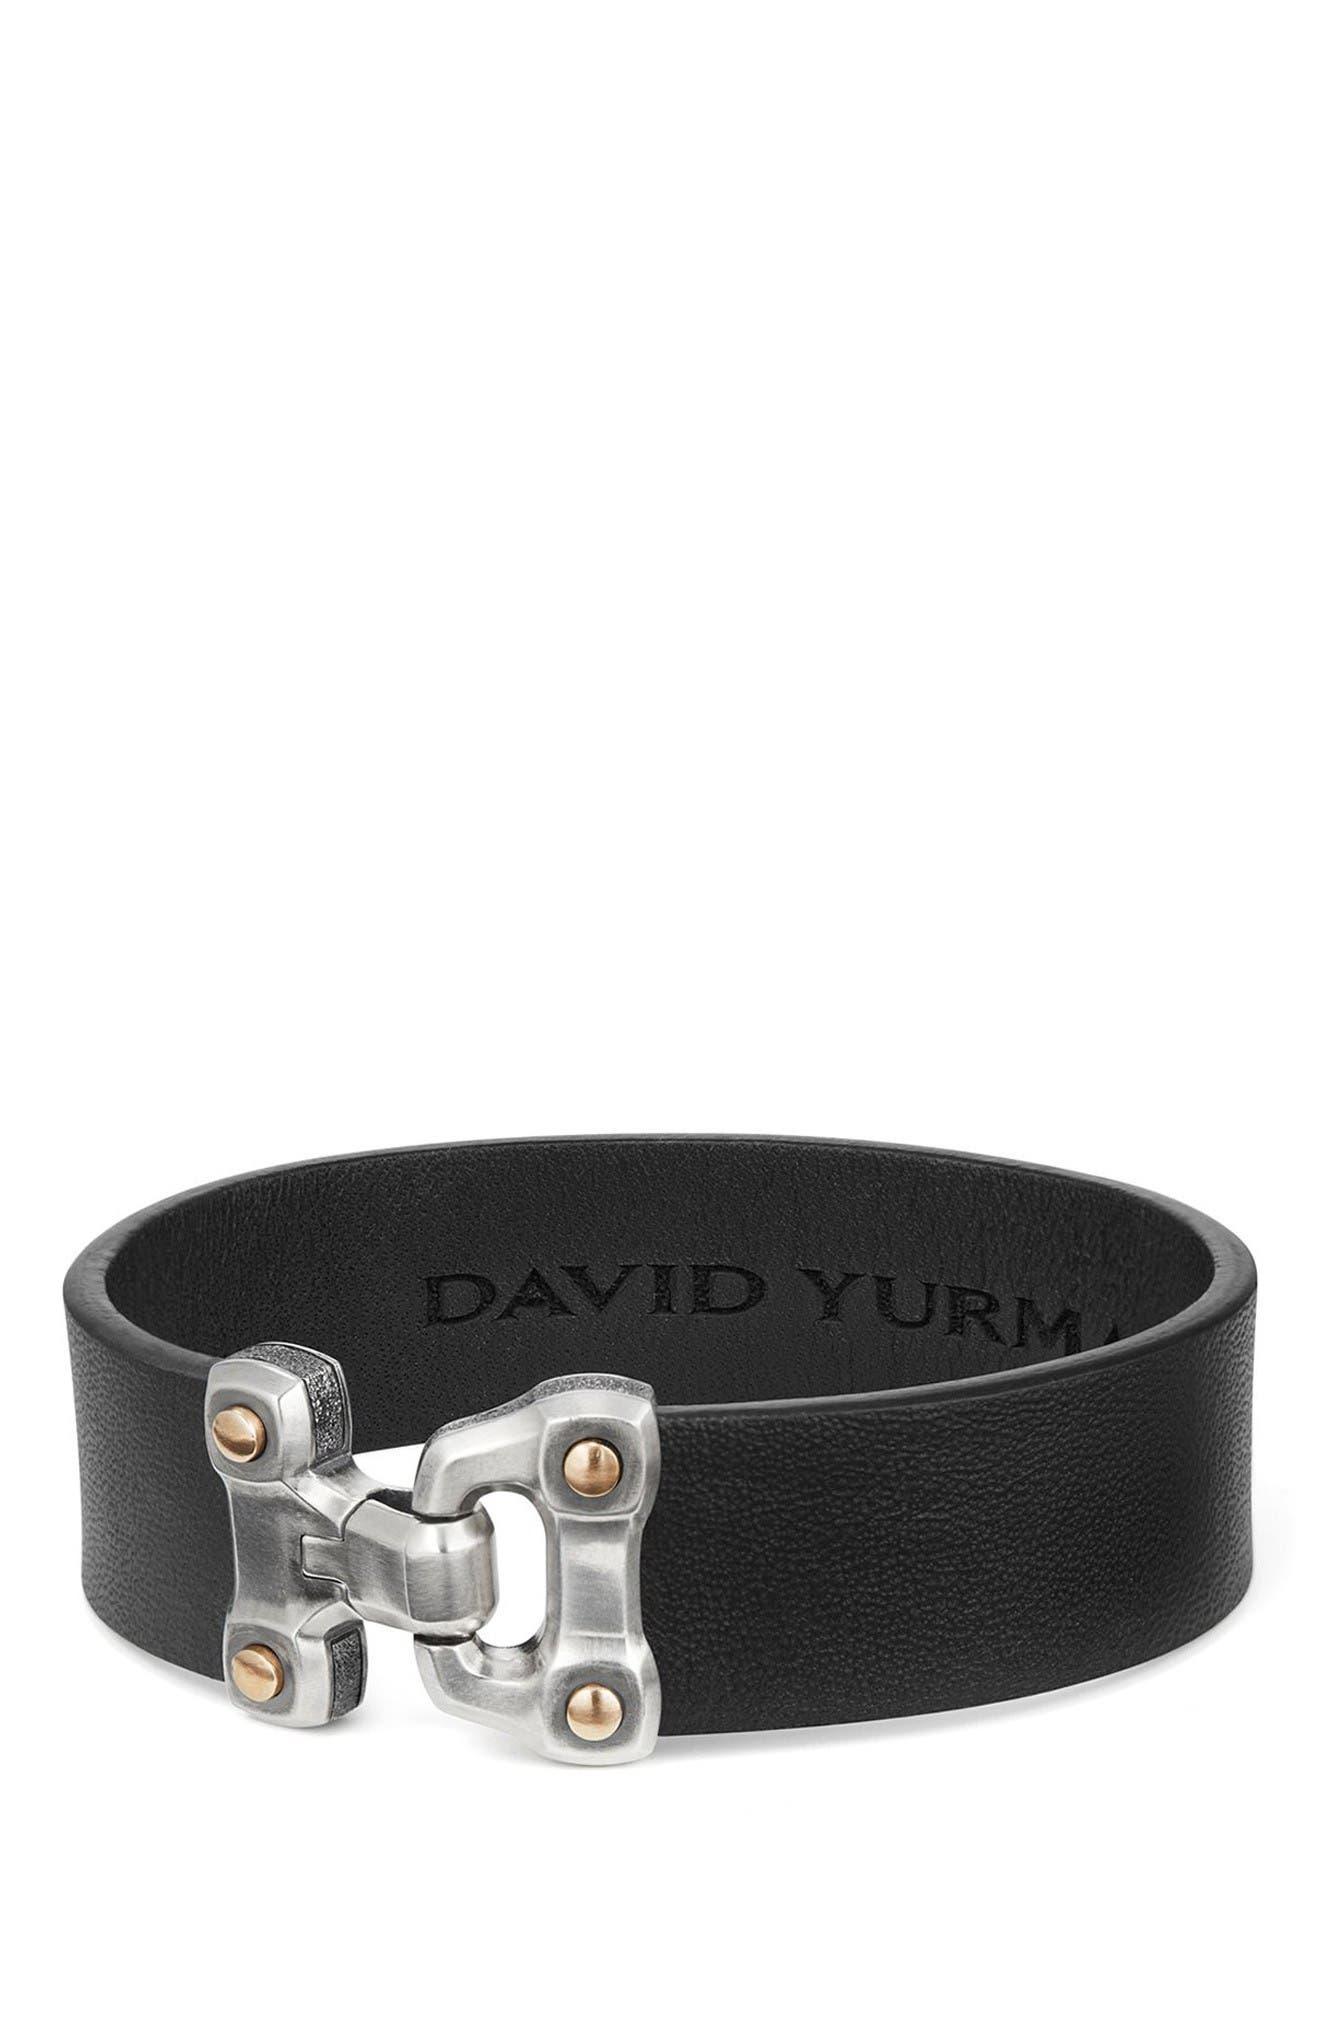 Anvil Leather Bracelet,                         Main,                         color, Silver/ Bronze/ Black Leather